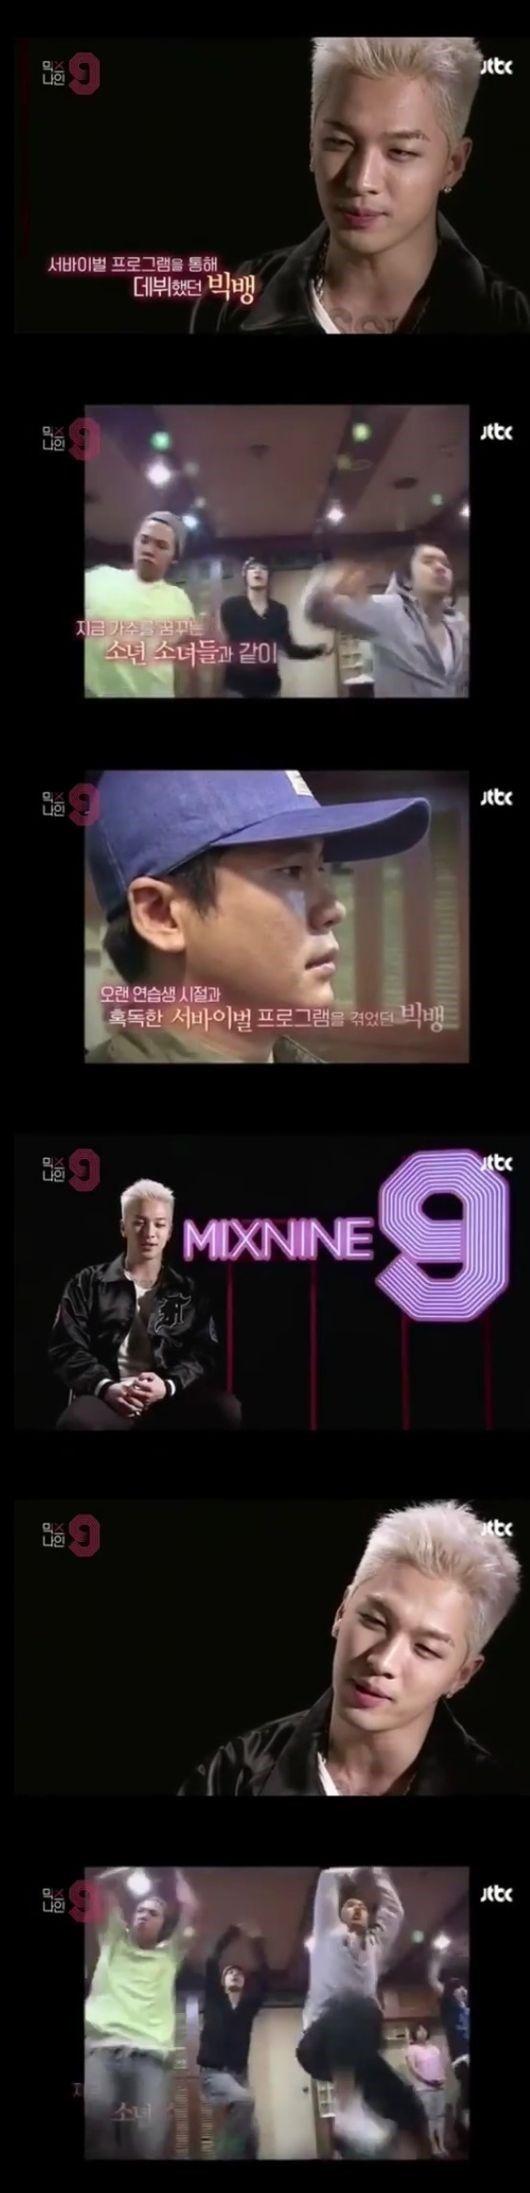 【BIGBANG NEWS】BIGBANG、過去の猛練習する姿に視線集中…YGヤン・ヒョンソク代表「MIX NINE」予告映像を公開